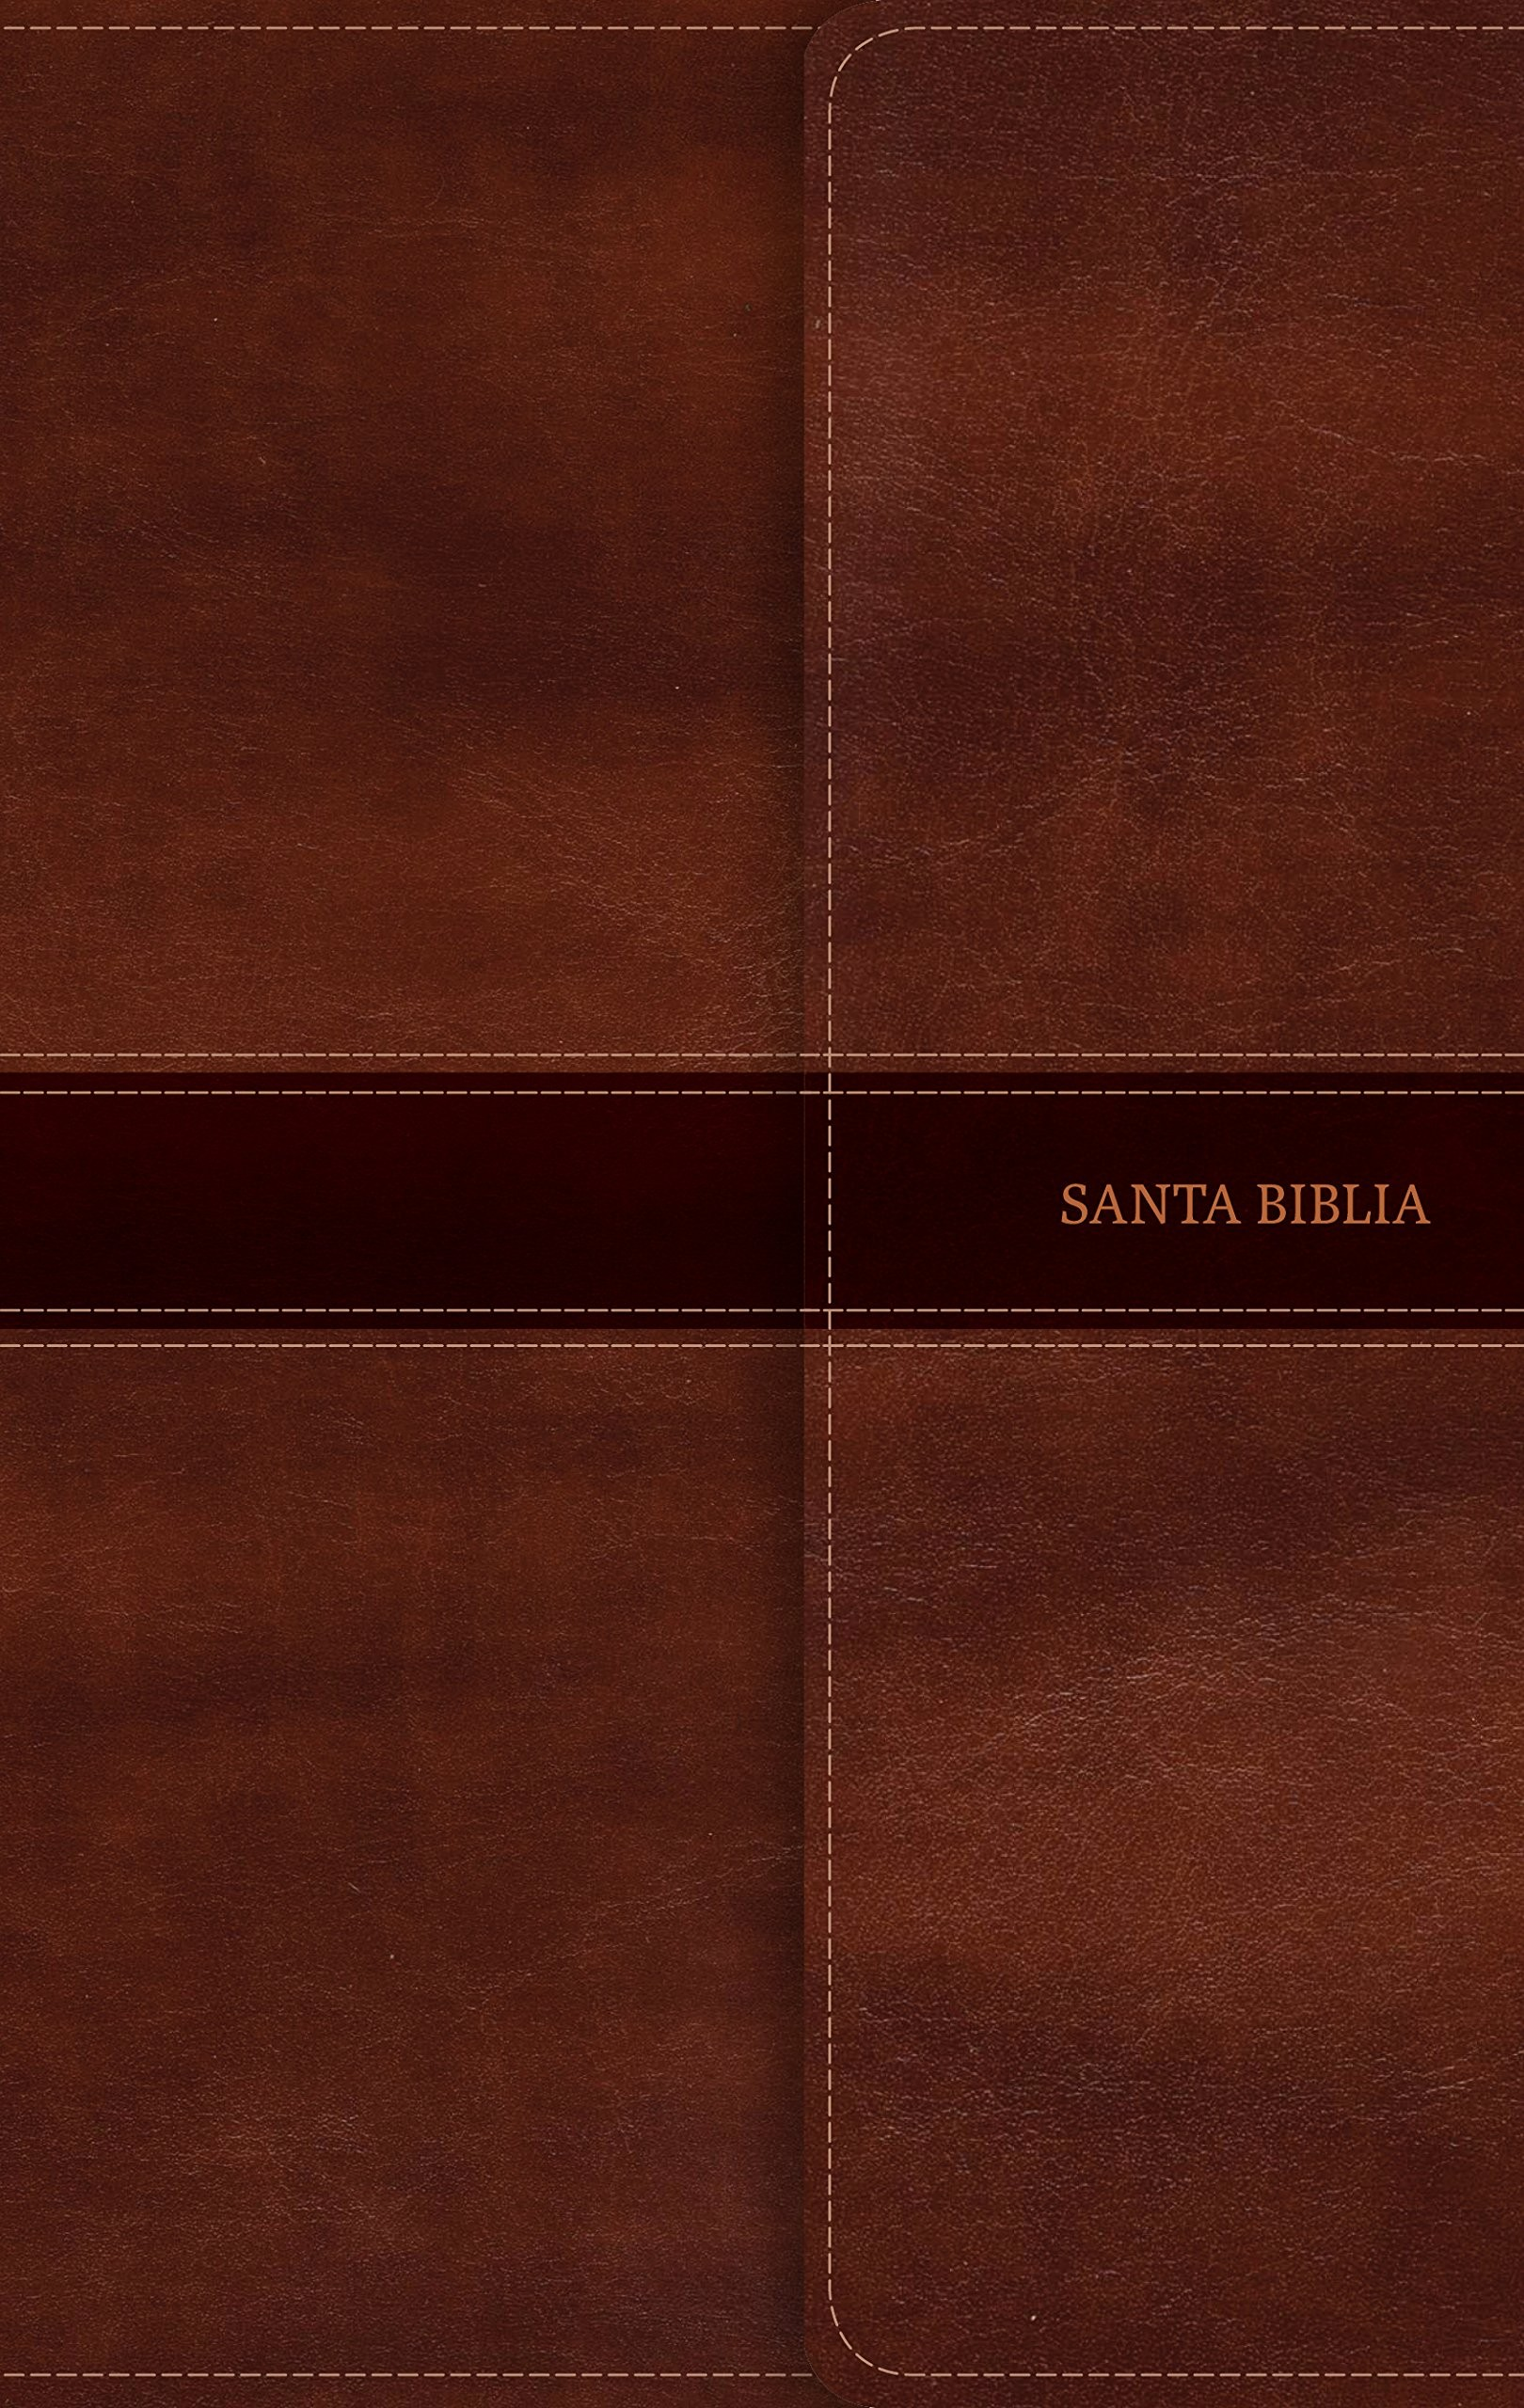 Biblia ultrafina. 2 tonos. Marrón. Solapa magnética - RVR60